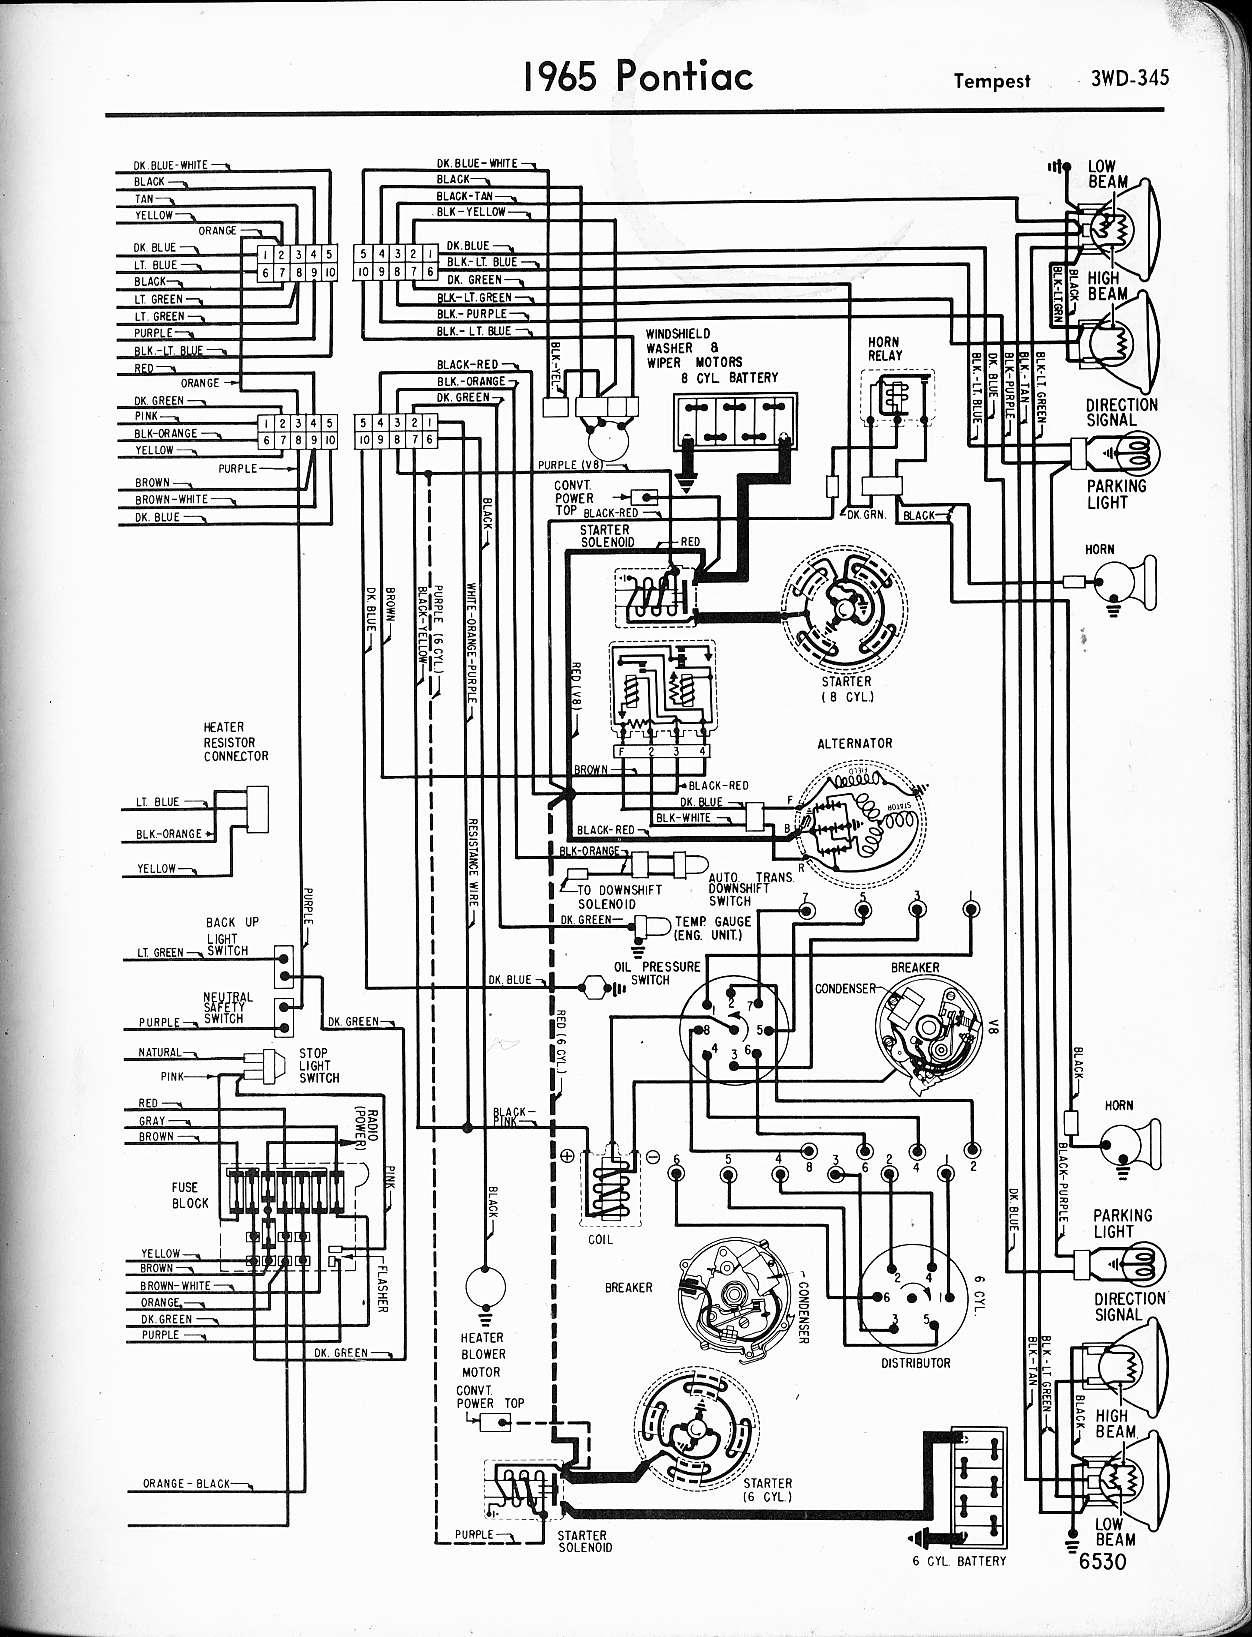 [DIAGRAM] Emg Hz H4 Wiring Diagram FULL Version HD Quality